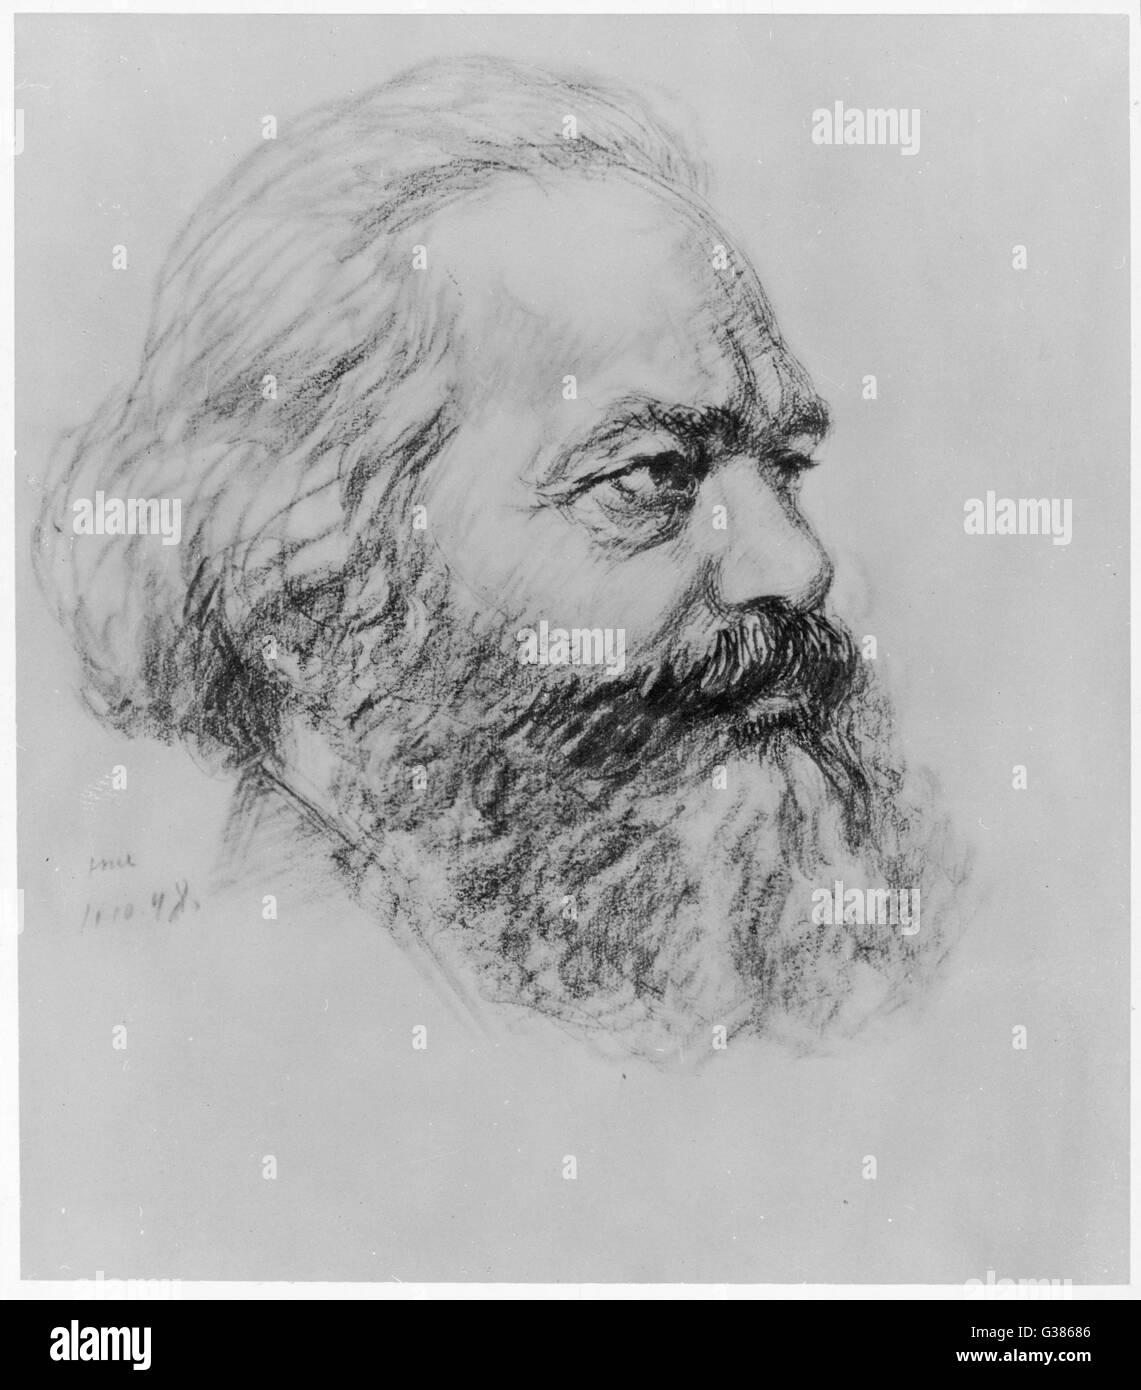 KARL MARX  German political theorist        Date: 1819 - 1883 - Stock Image